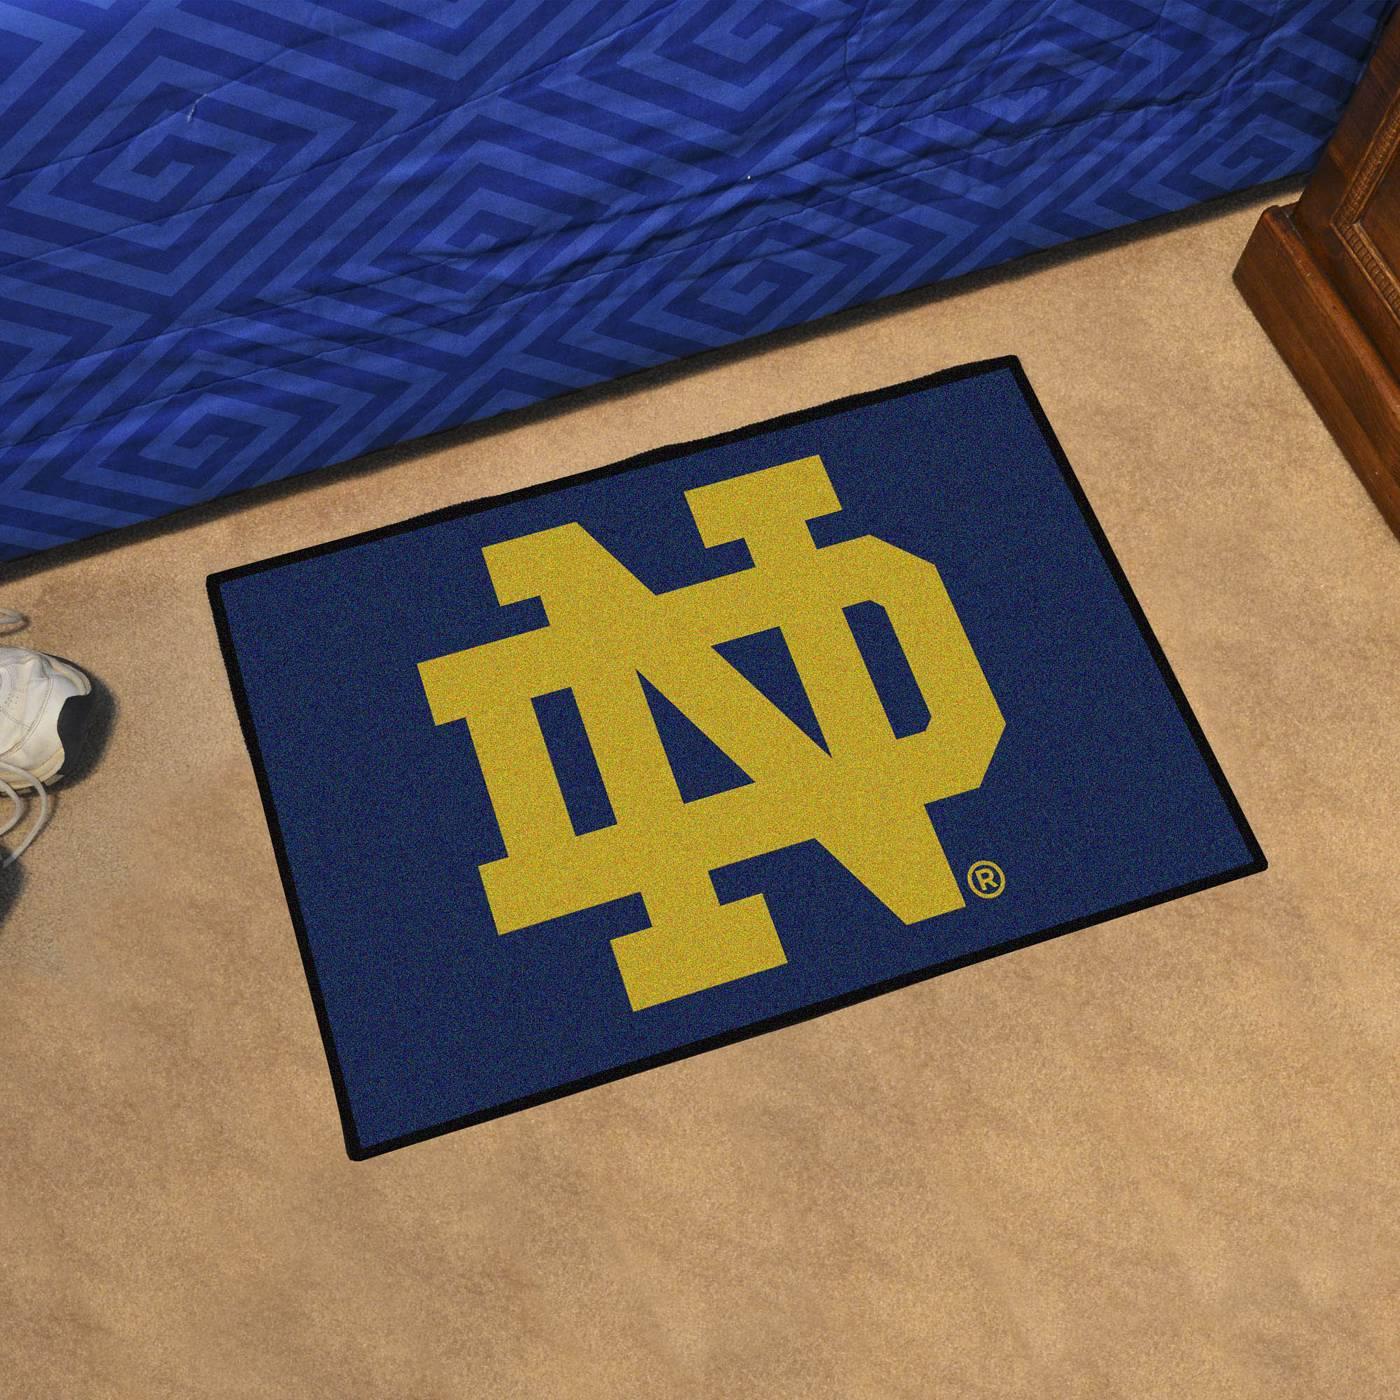 Notre Dame Fighting Irish Quot Nd Quot Starter Rug